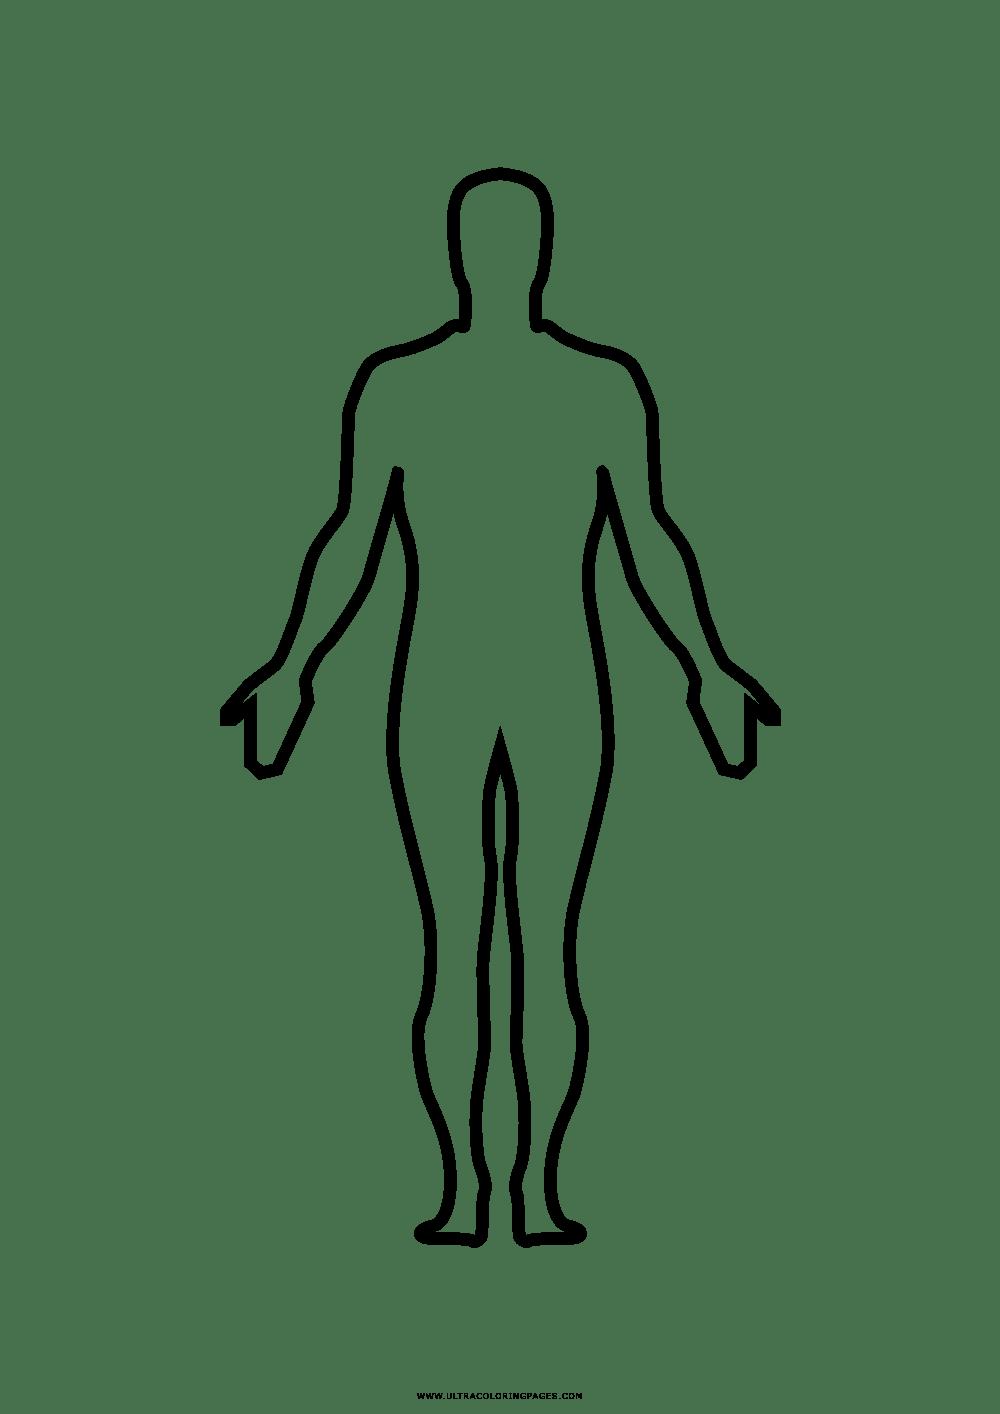 Corpo Humano Desenho Para Colorir